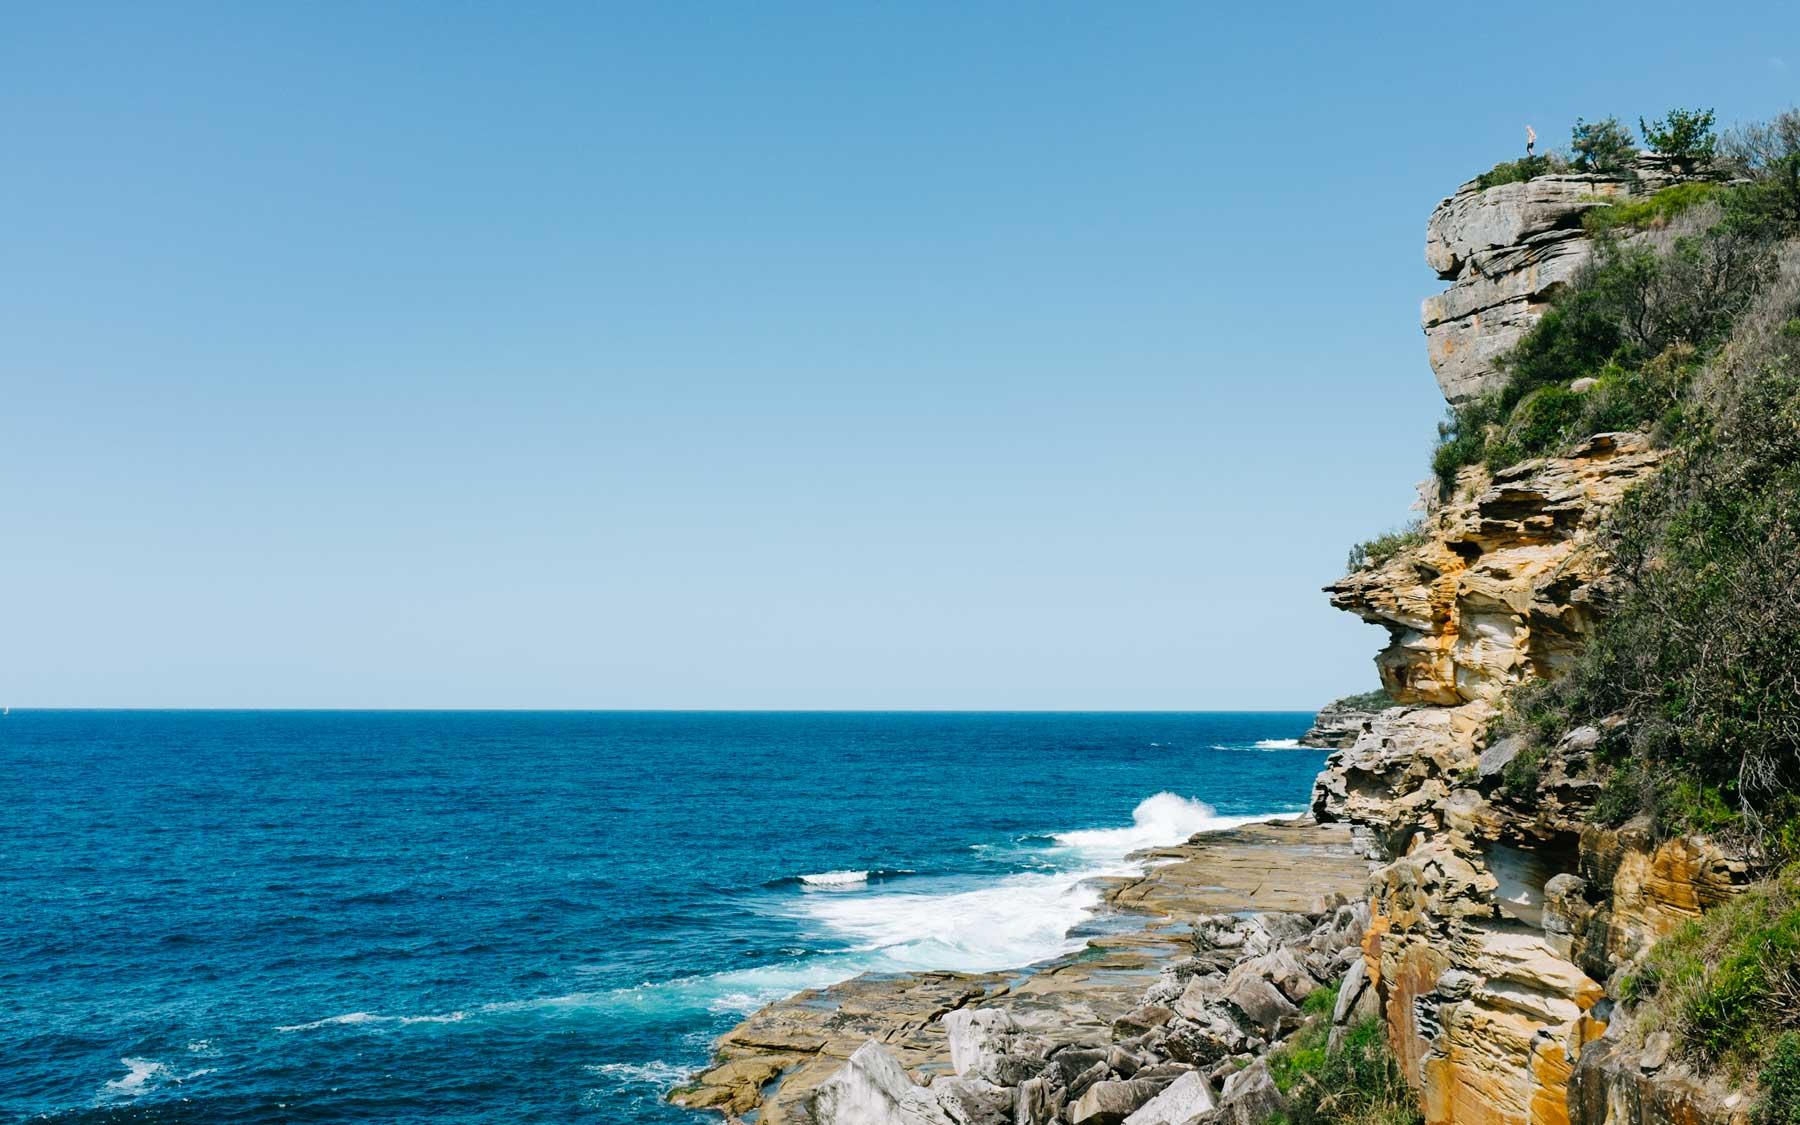 An onlooker stands on a rocky outcrop around from Shelly Beach.